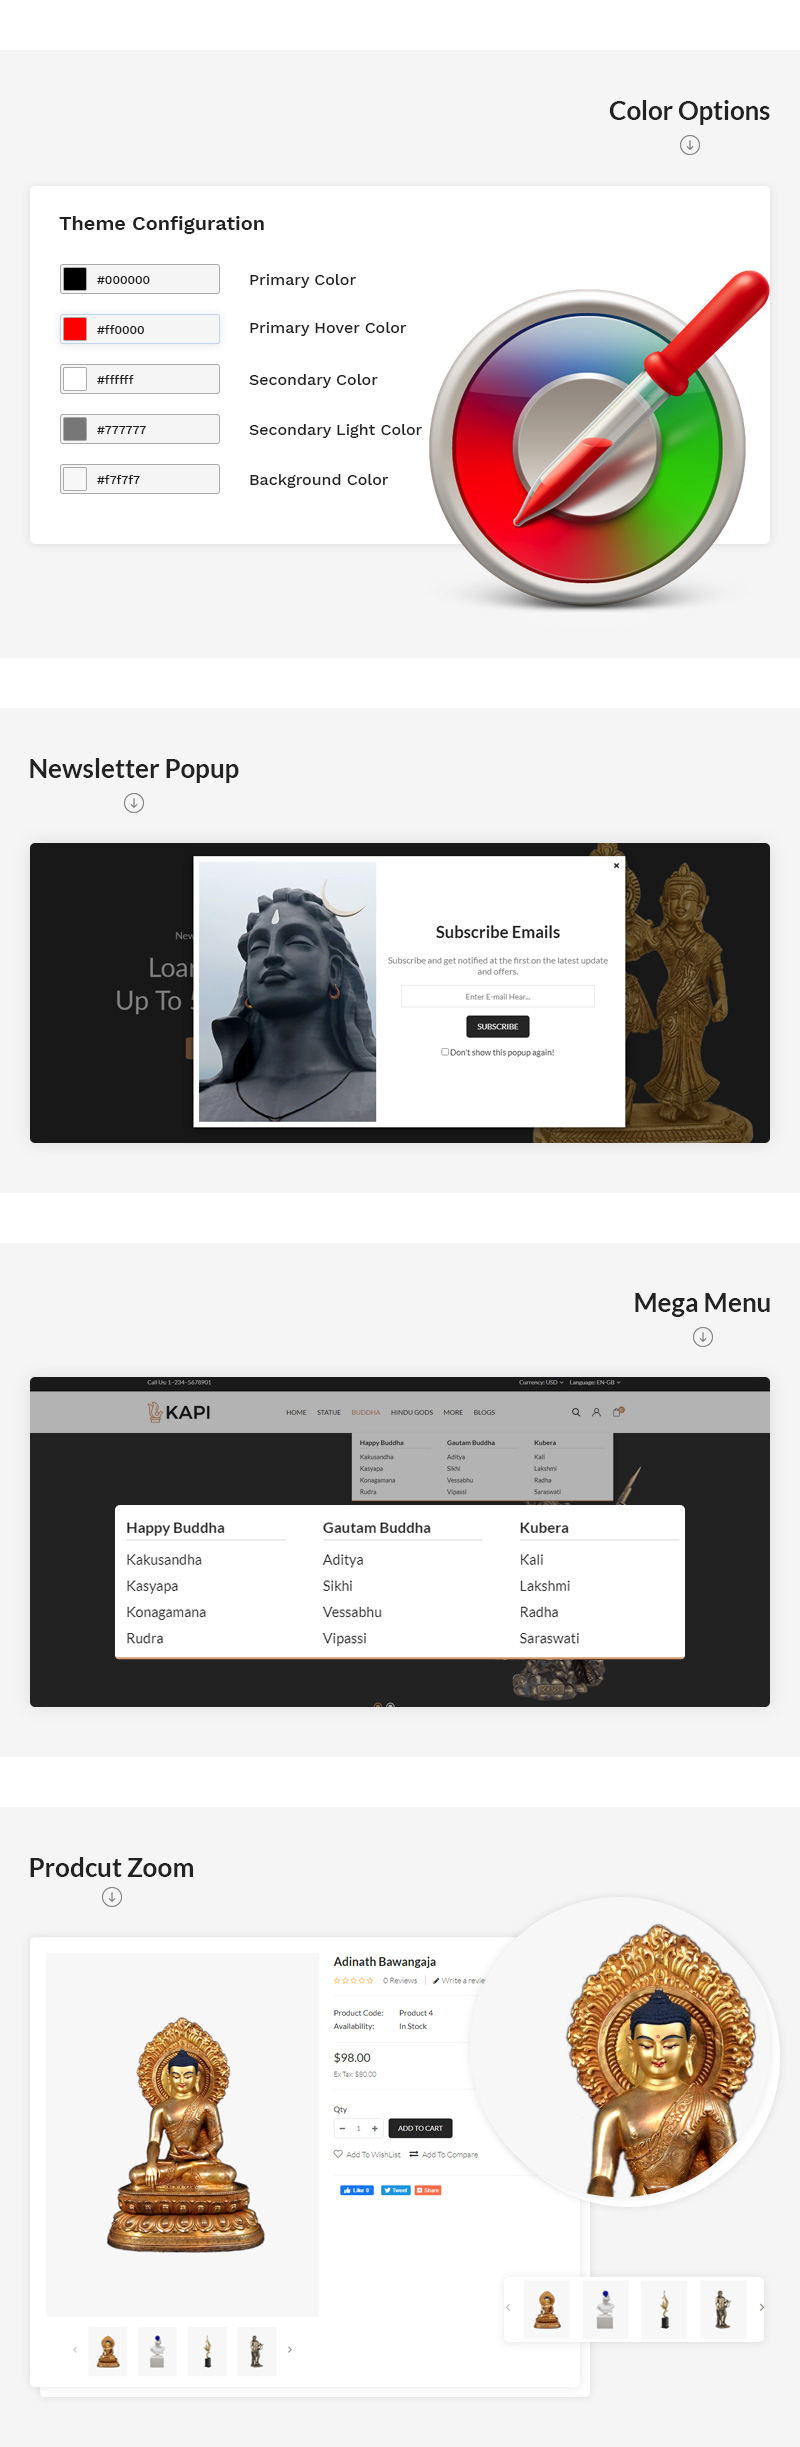 kapi-features-3.jpg